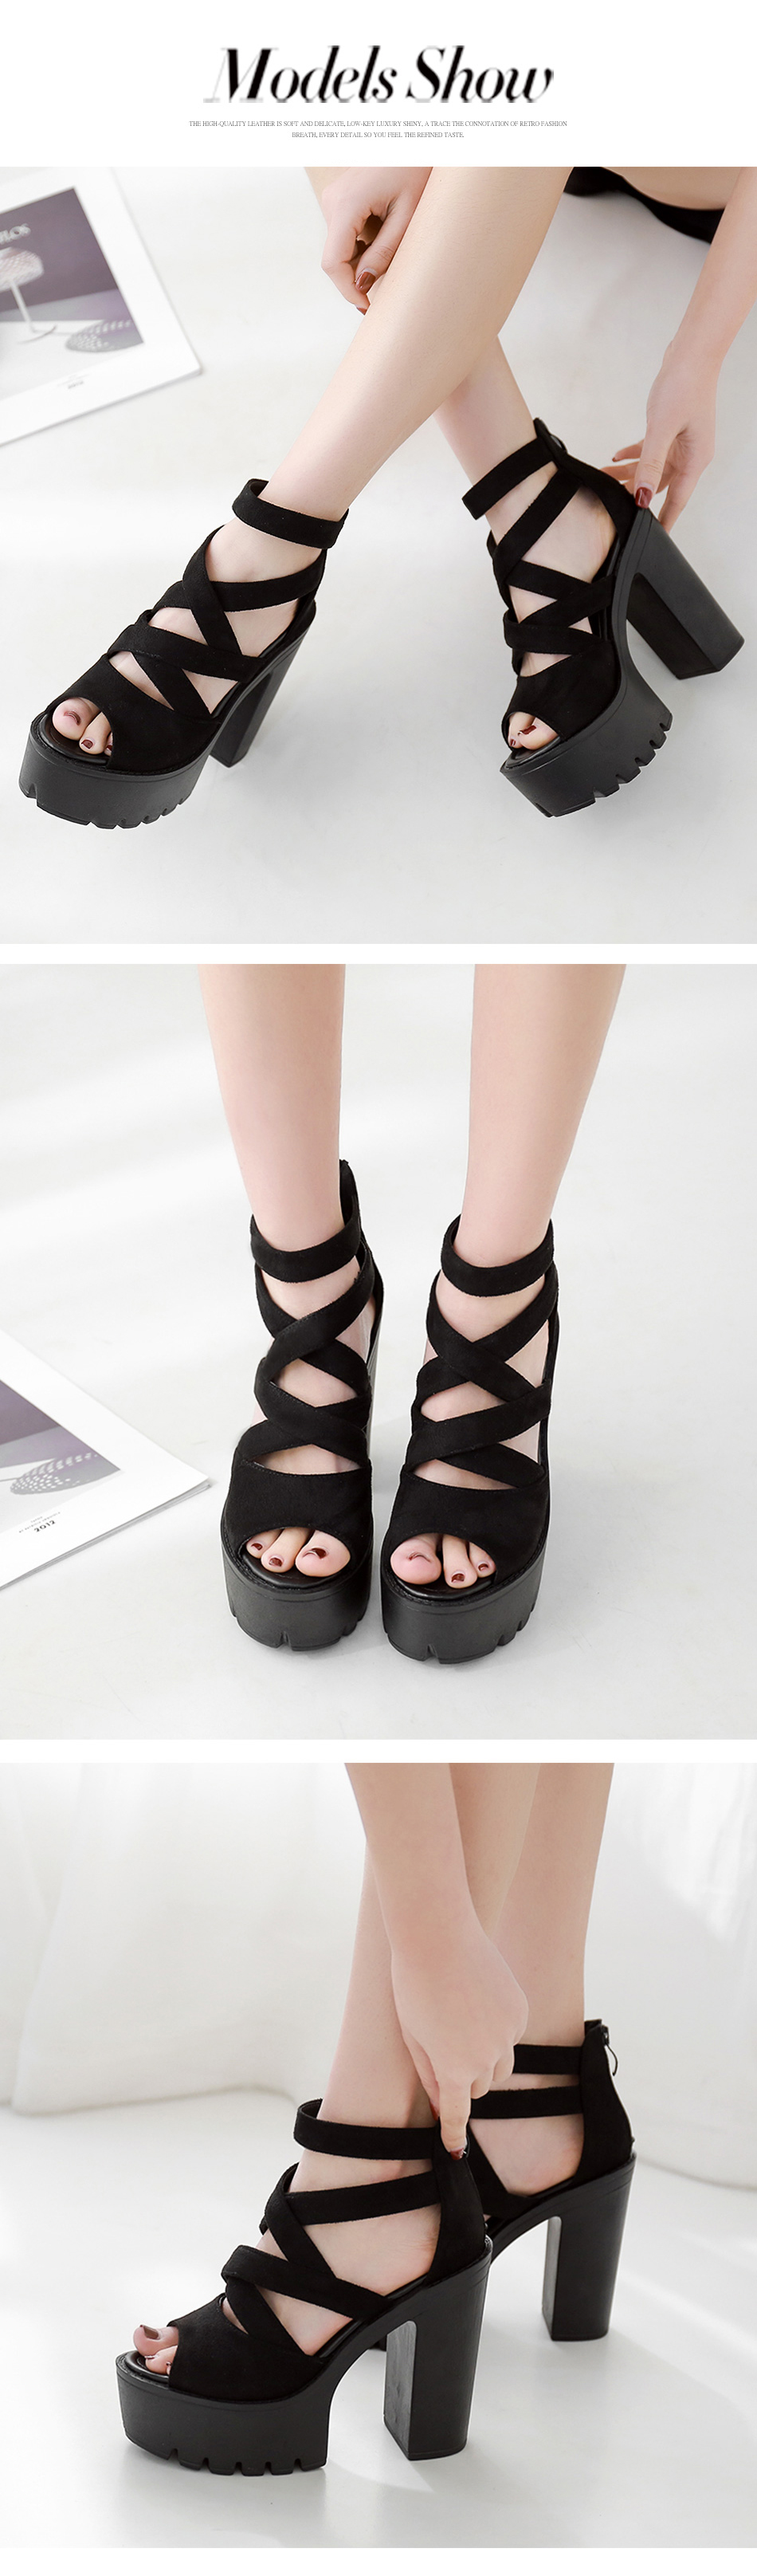 gladiator sandals woman